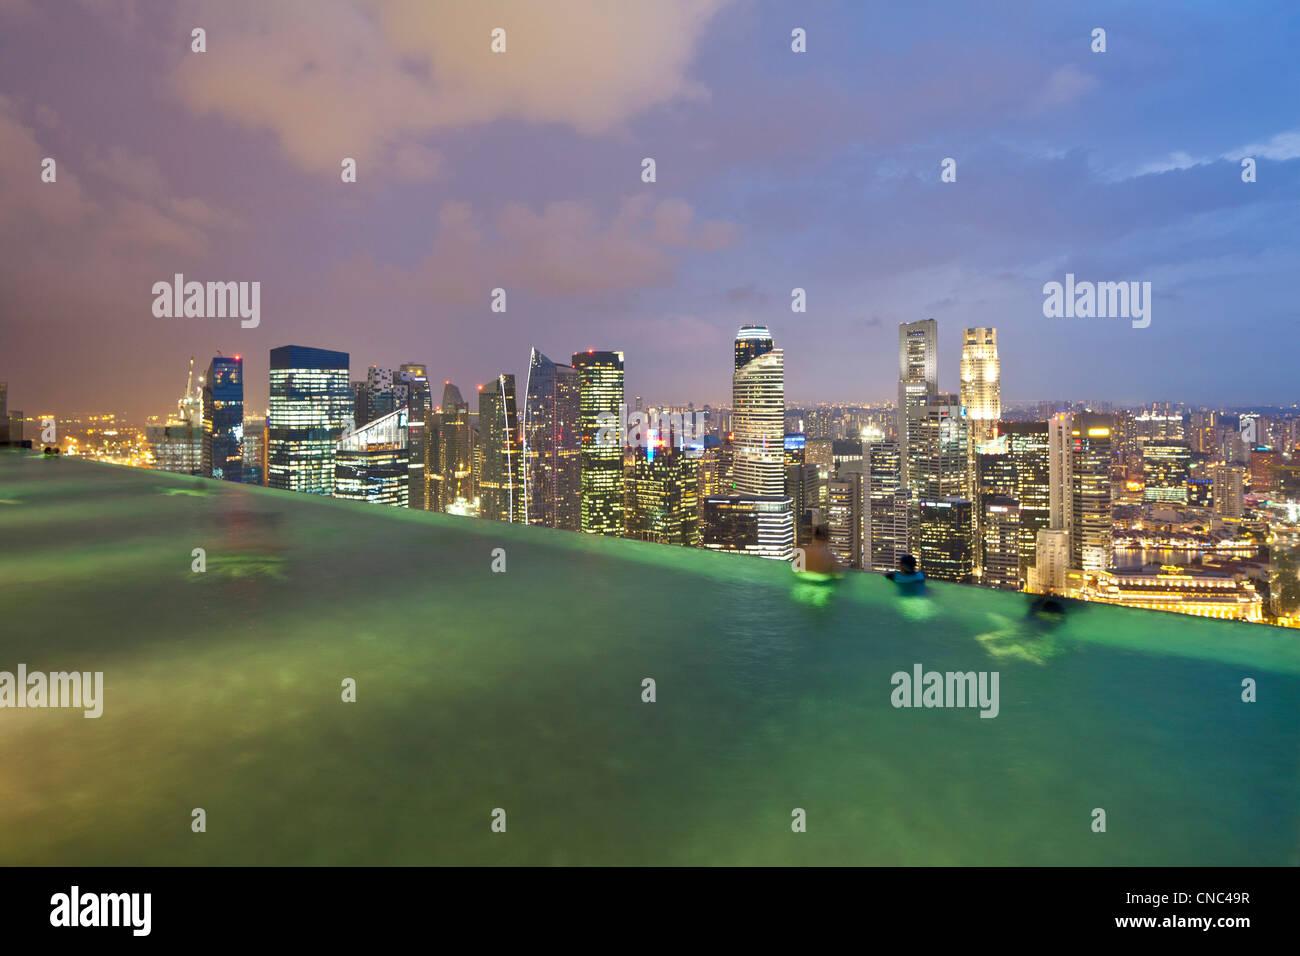 Singapore, Marina Bay, Marina Bay Sands Hotel opened in 2010, designed by architect Moshe Safdie for 4.5 billion - Stock Image